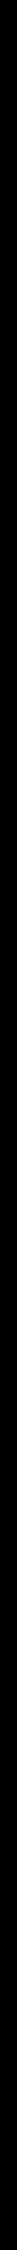 black copy 10.jpg